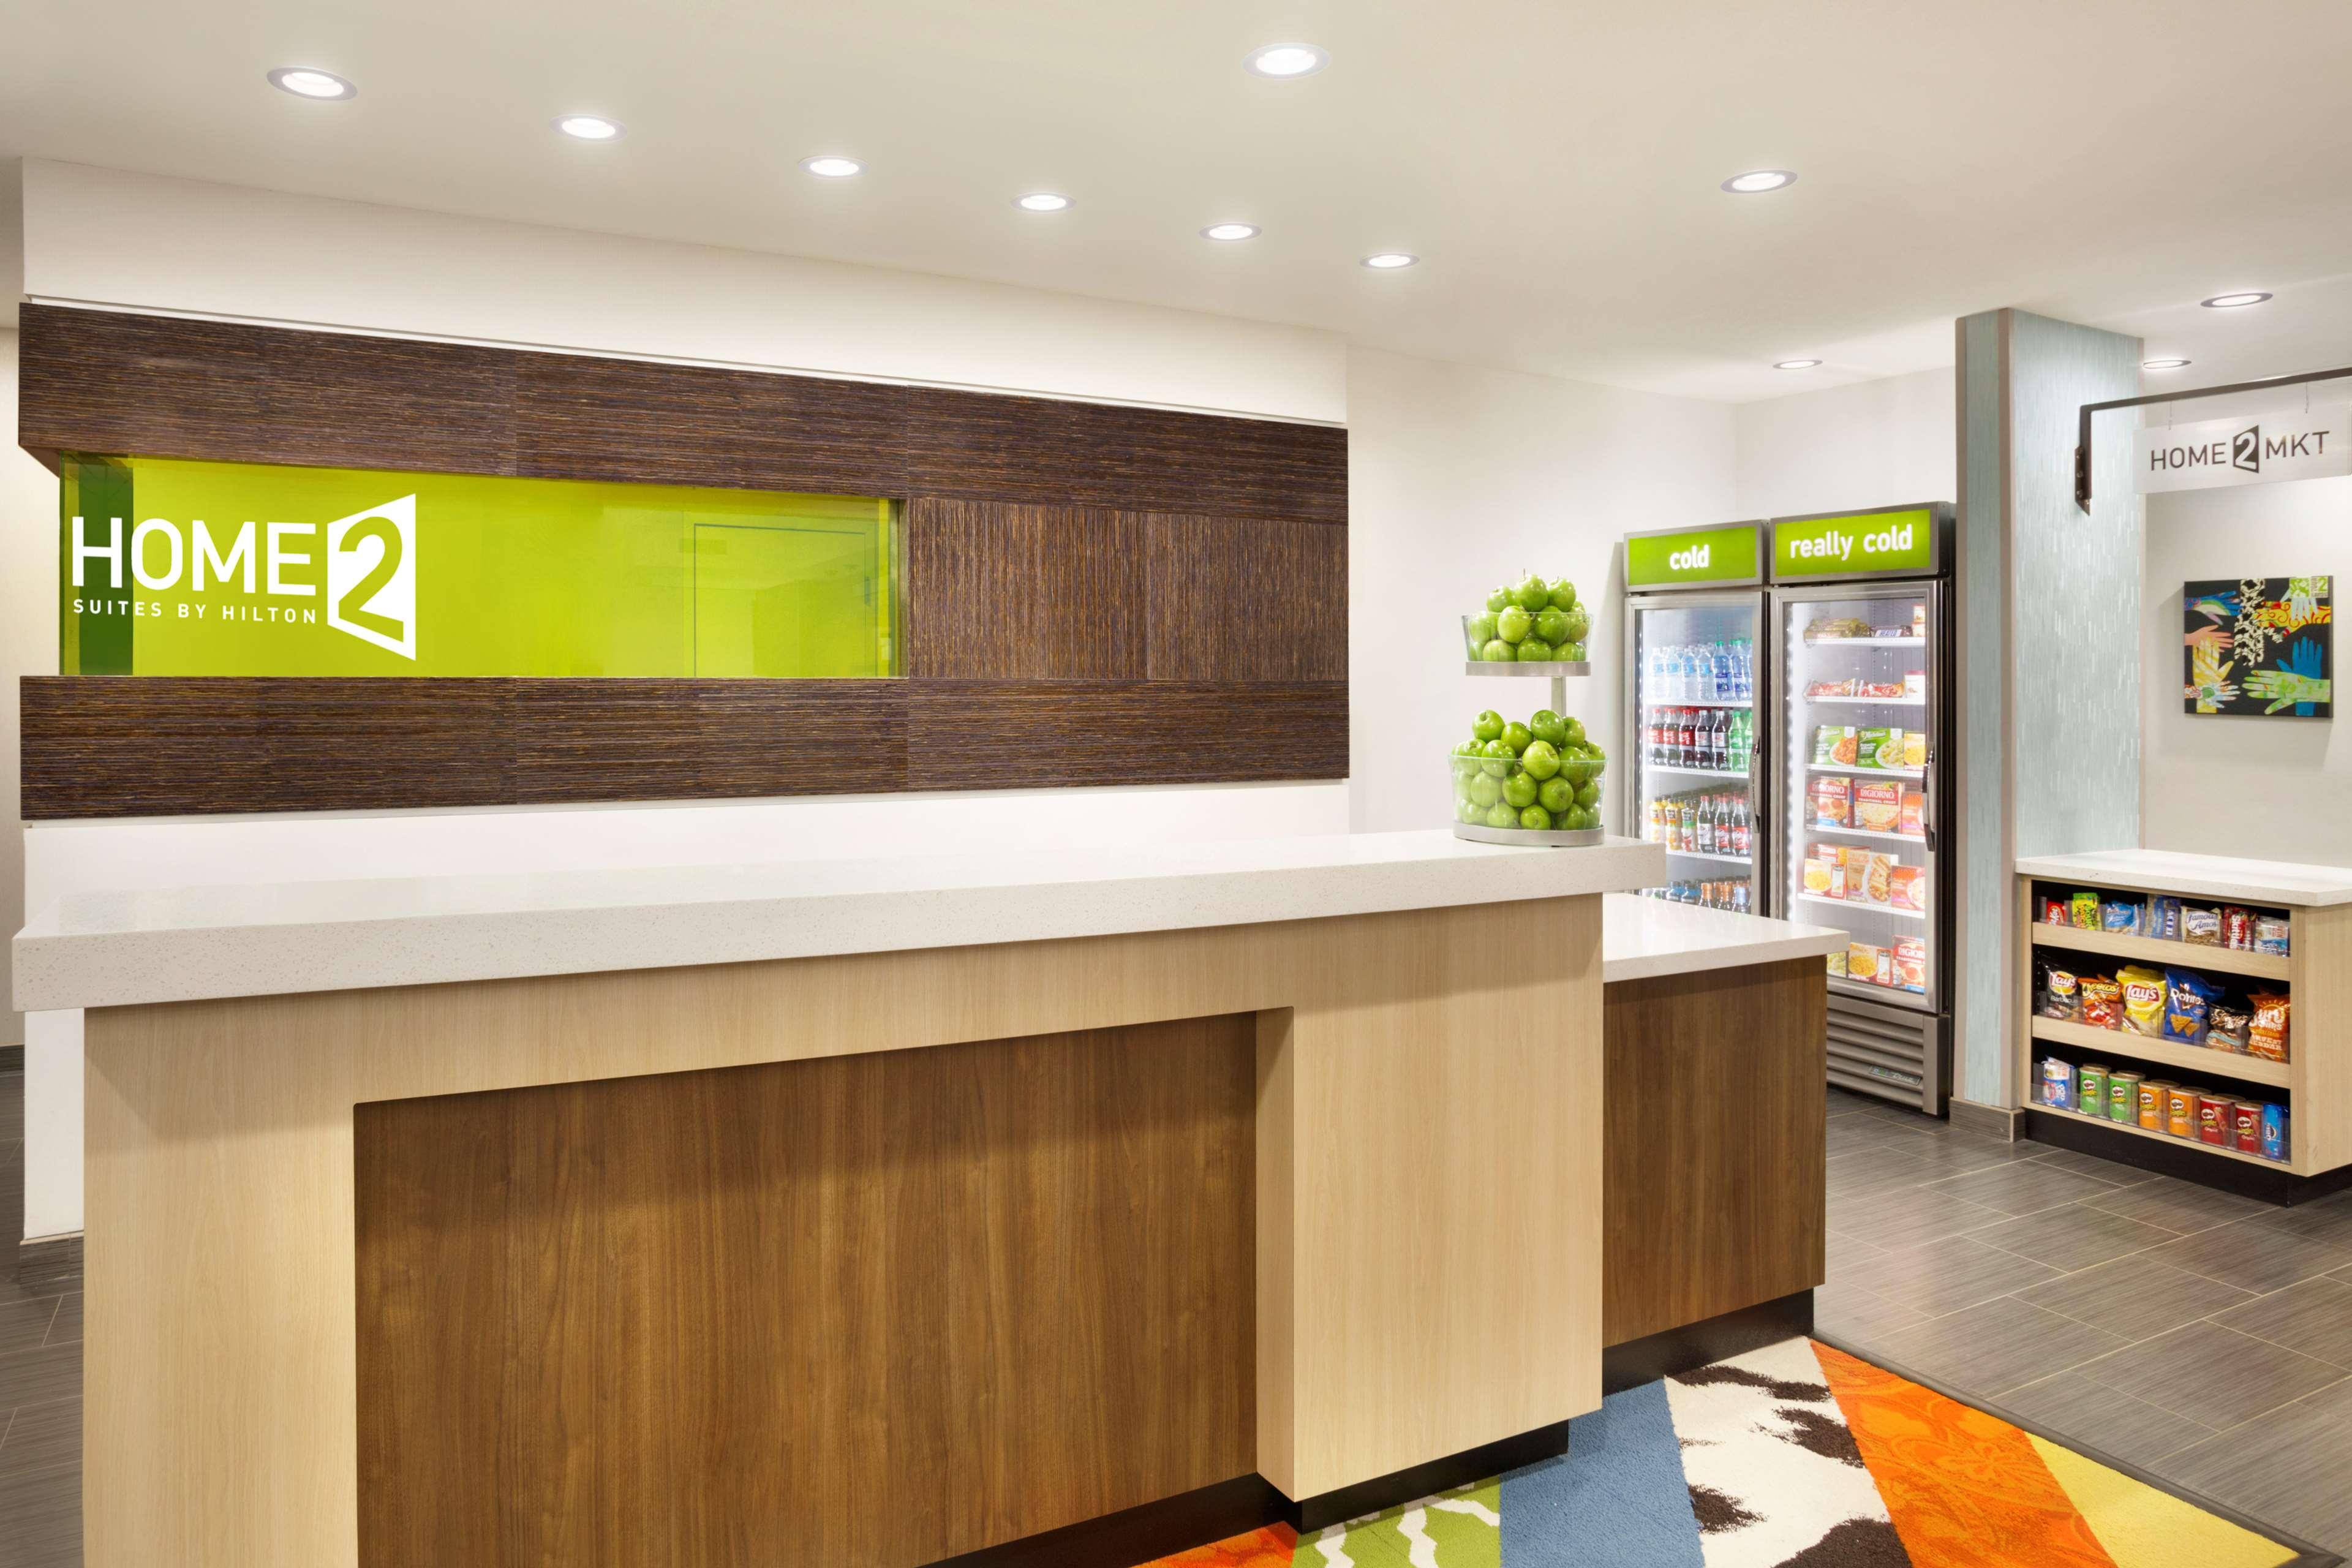 Home2 Suites by Hilton Houston/Webster image 6